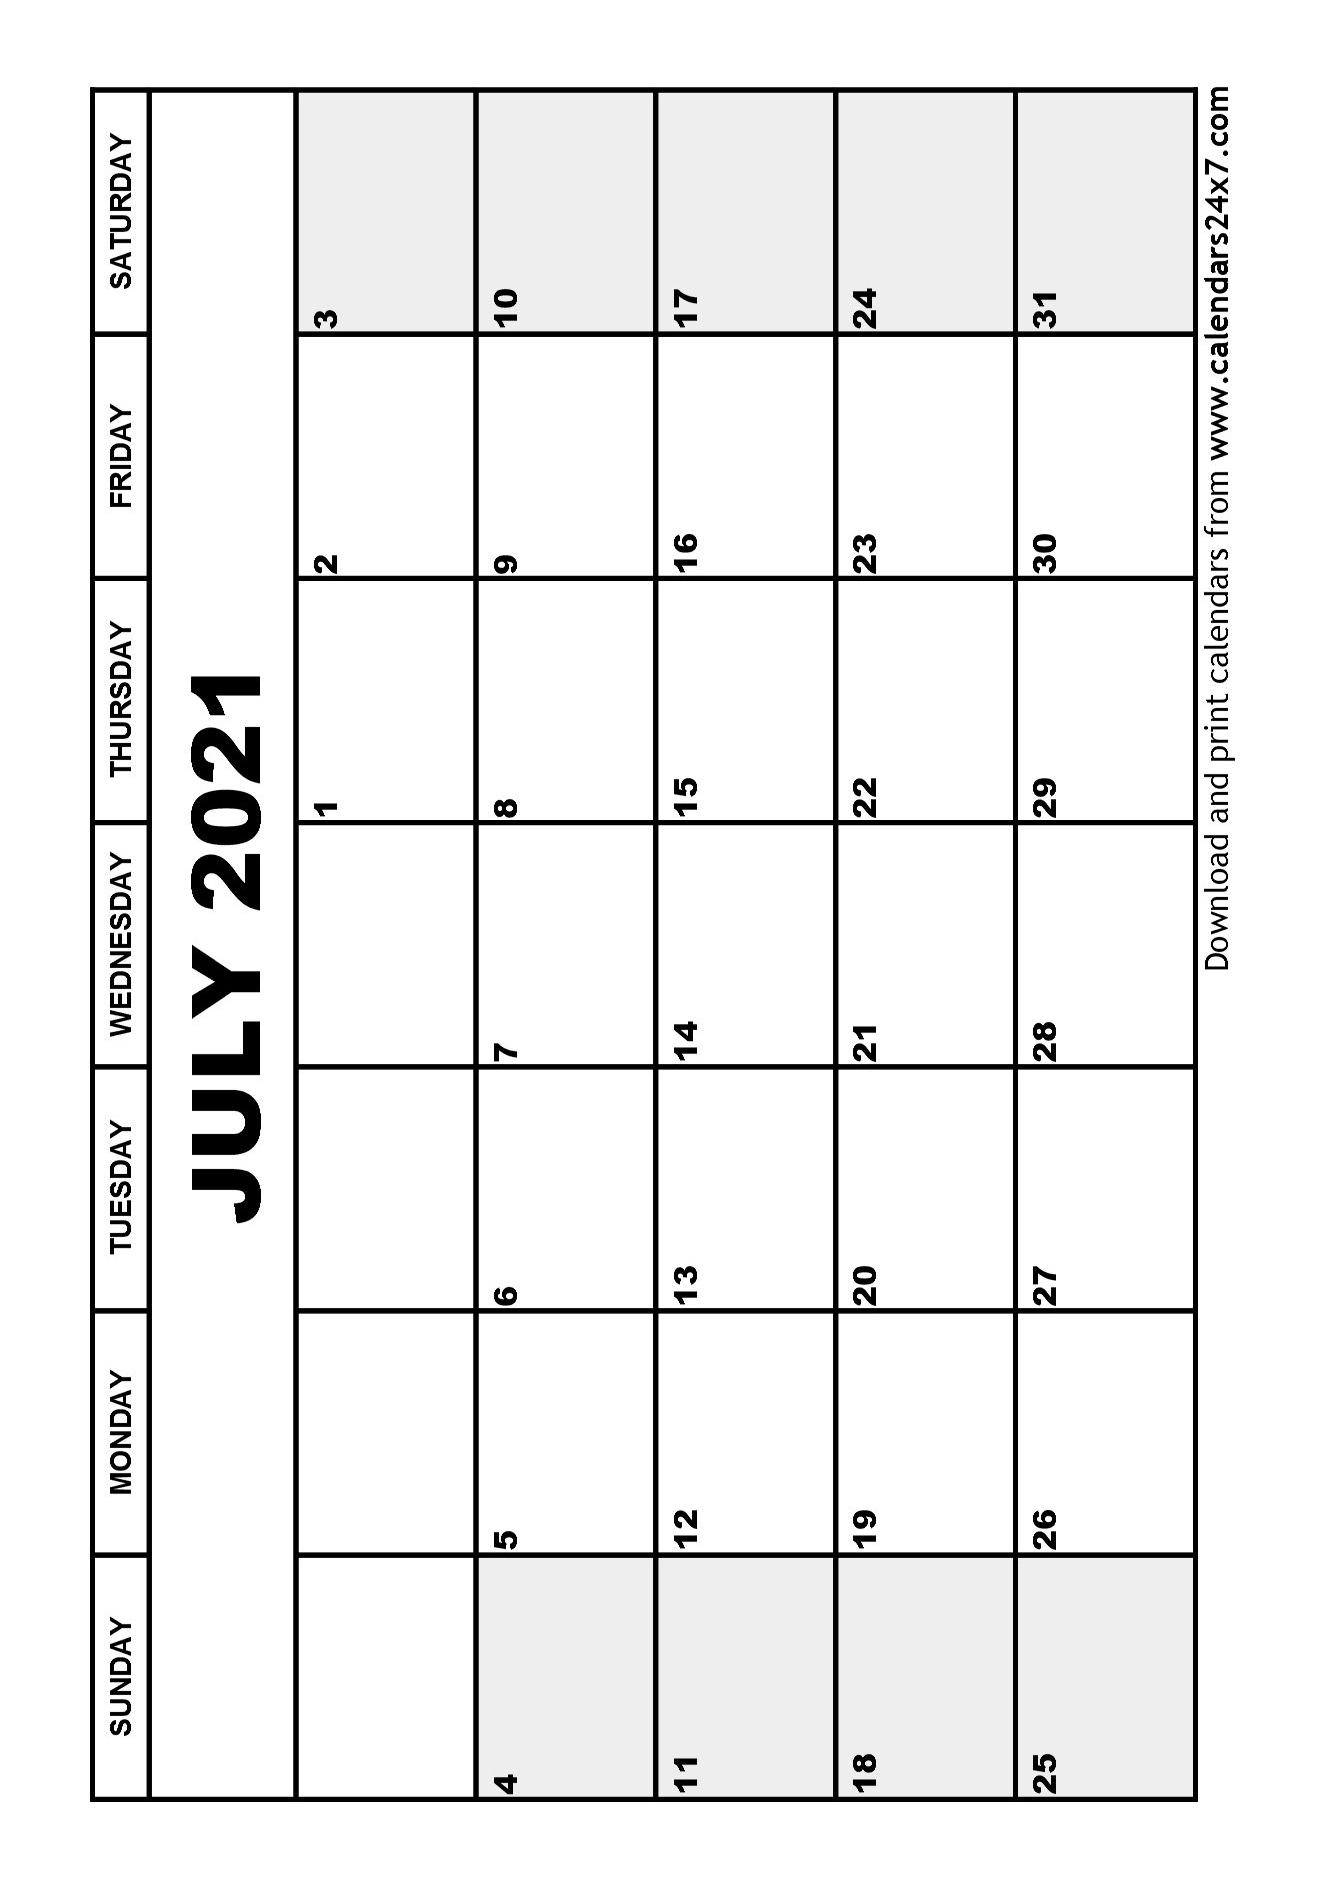 July 2021 Calendar & August 2021 Calendar Blank July 2021 Calendar Printable